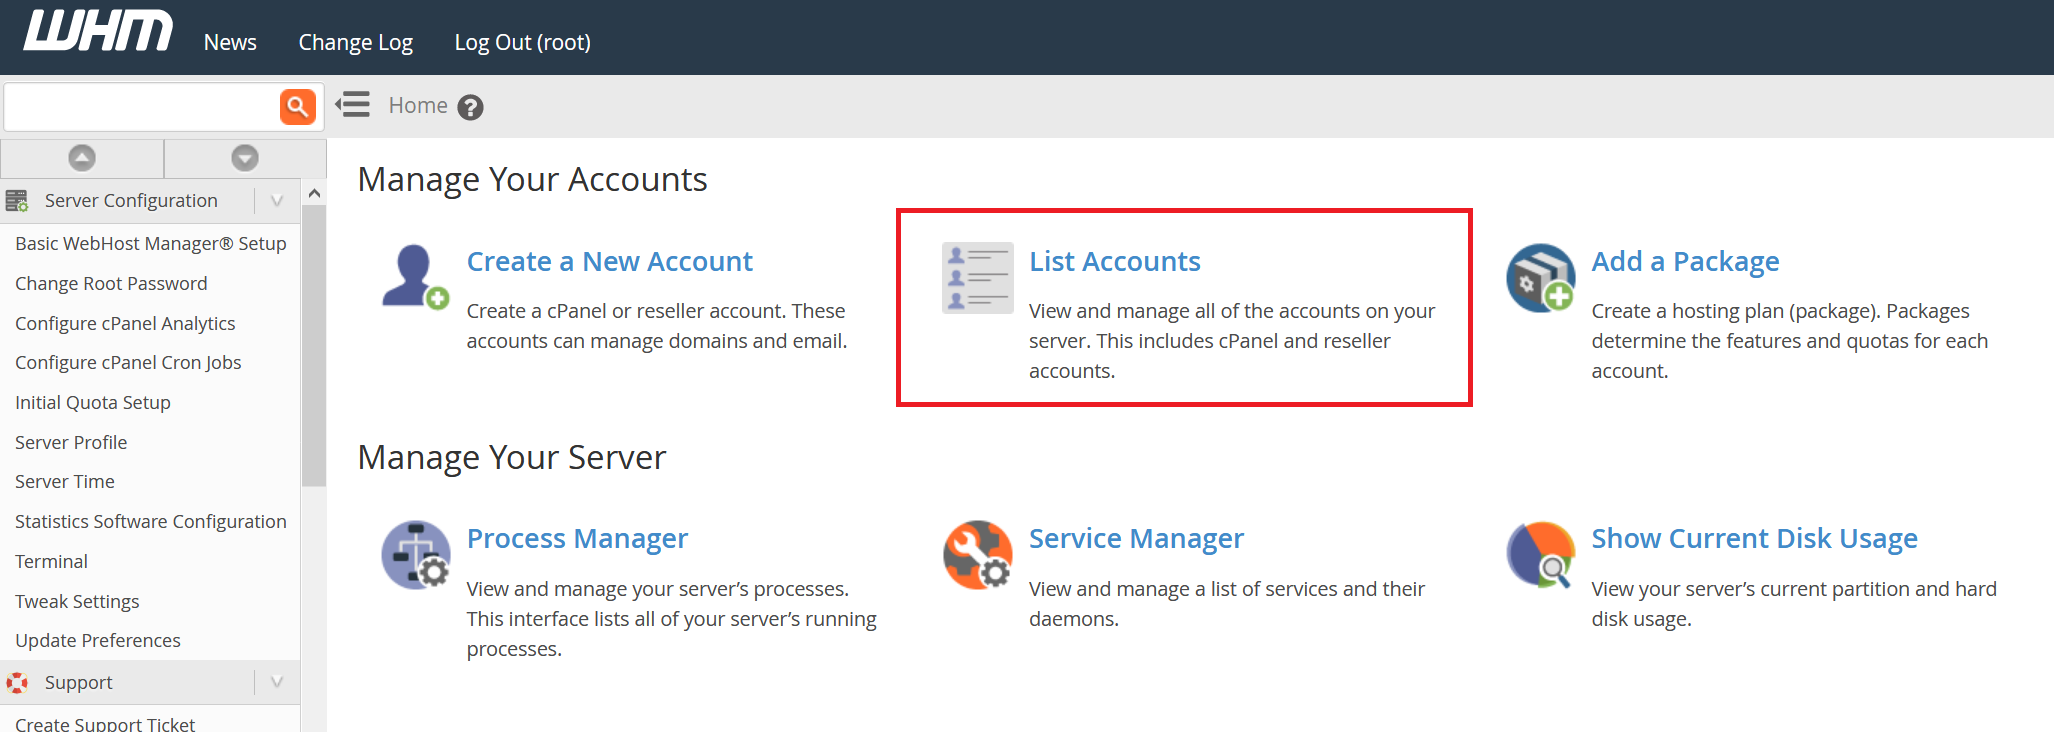 whm manage accounts list accounts